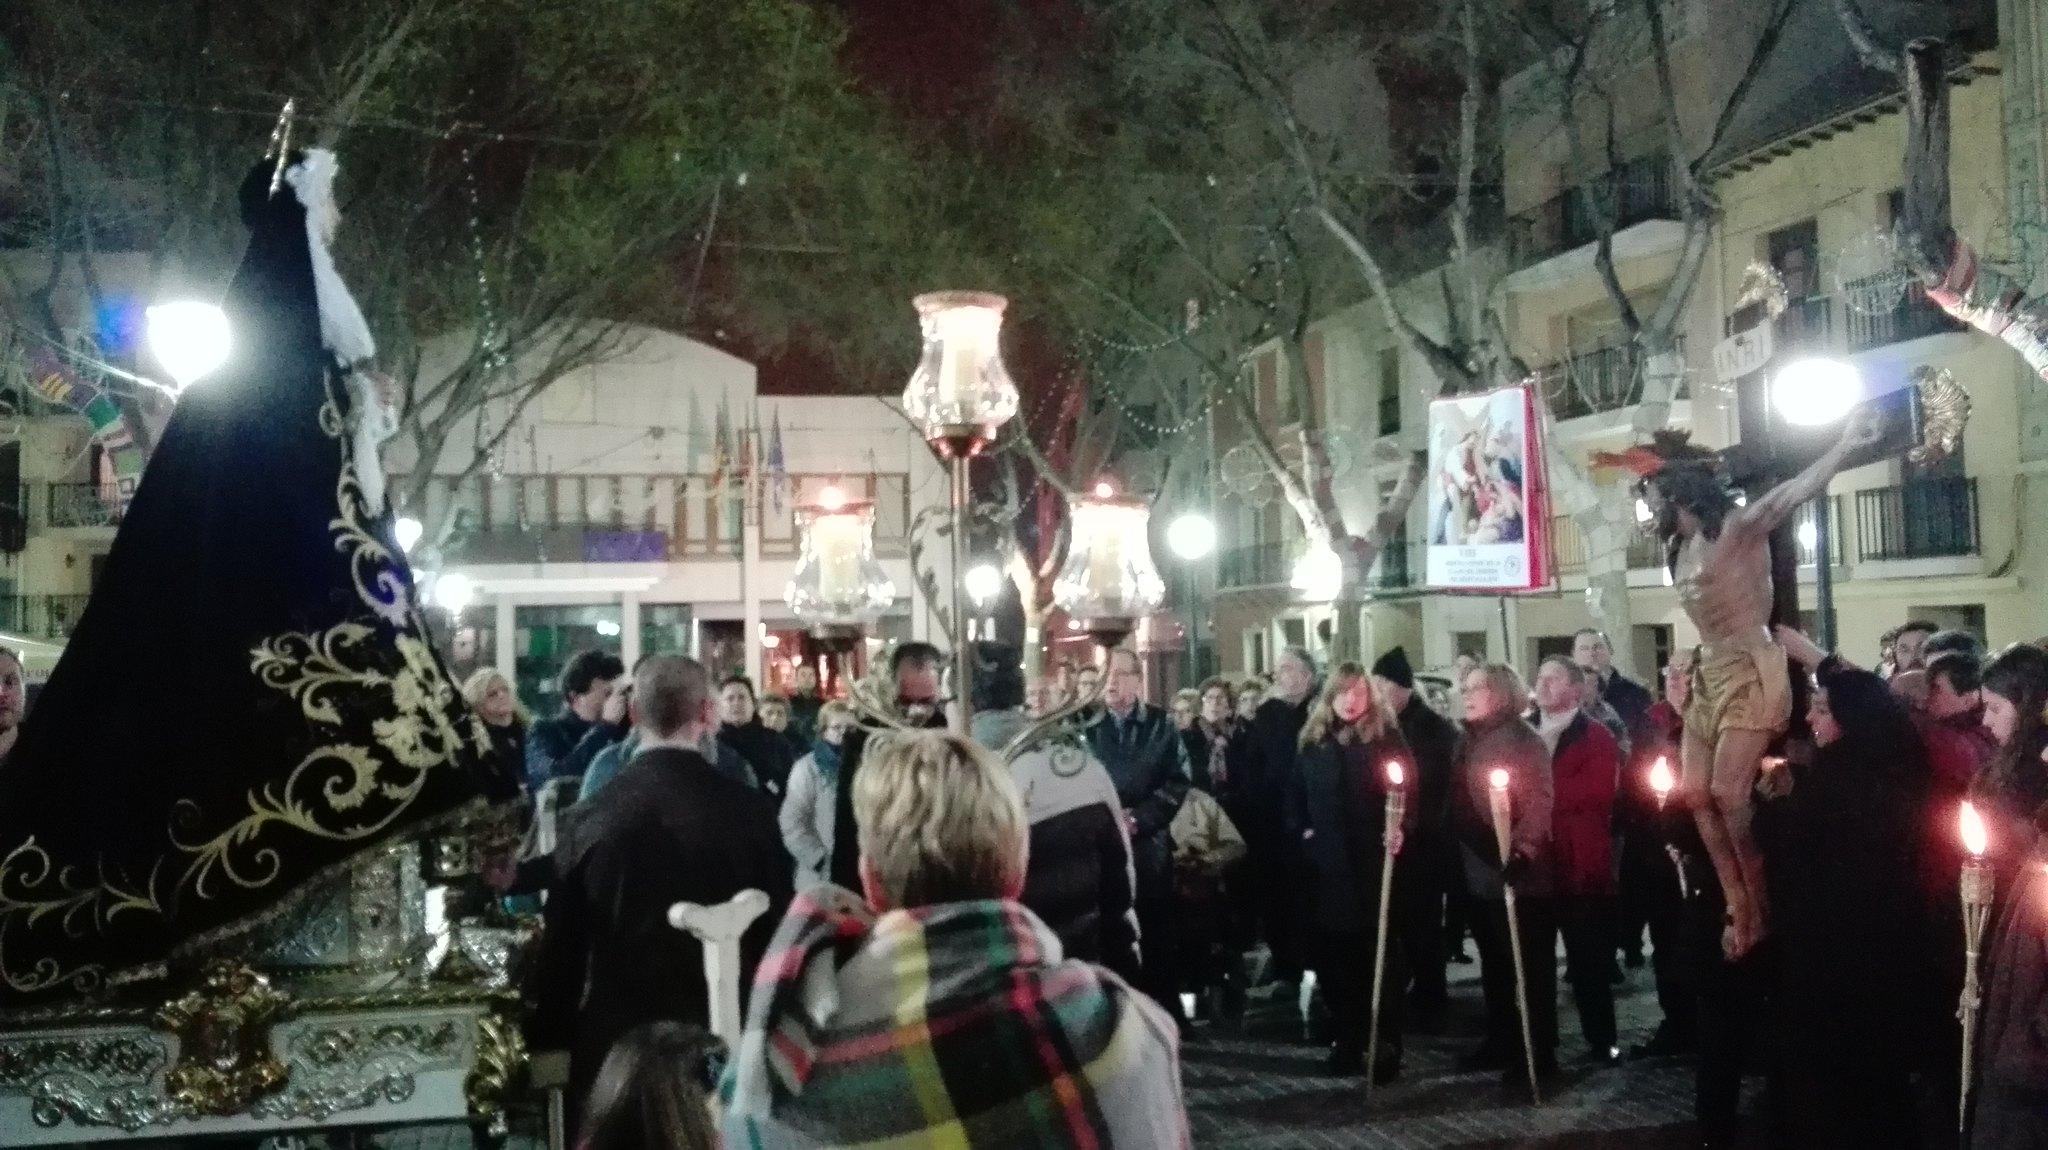 (2016-03-18) - VII Vía Crucis nocturno - Javier Romero Ripoll (069)